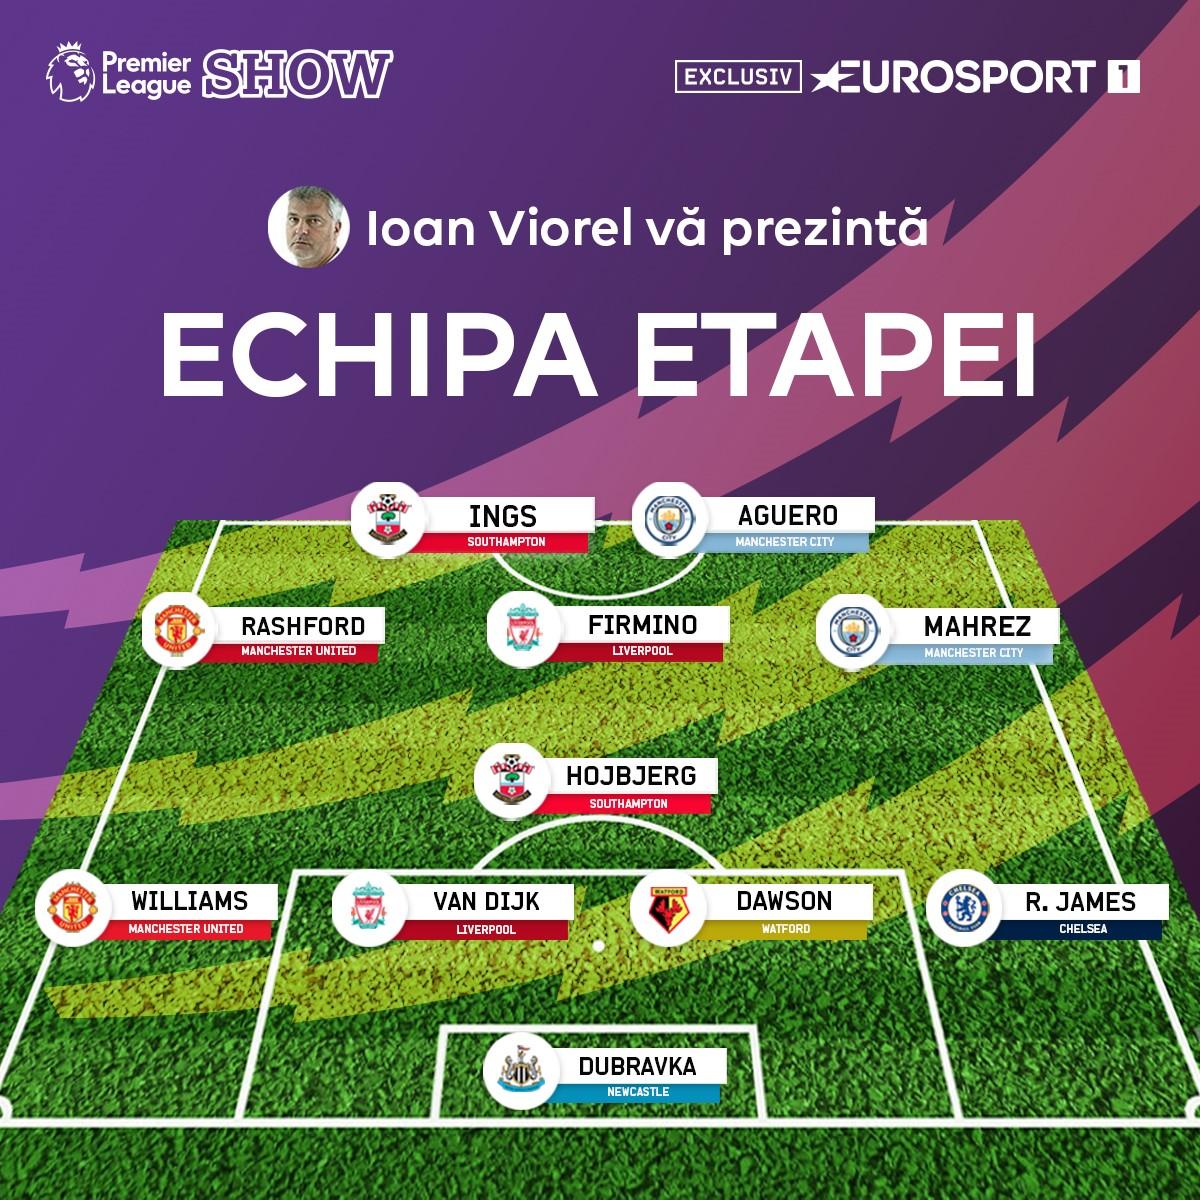 https://i.eurosport.com/2020/01/15/2753602.jpg